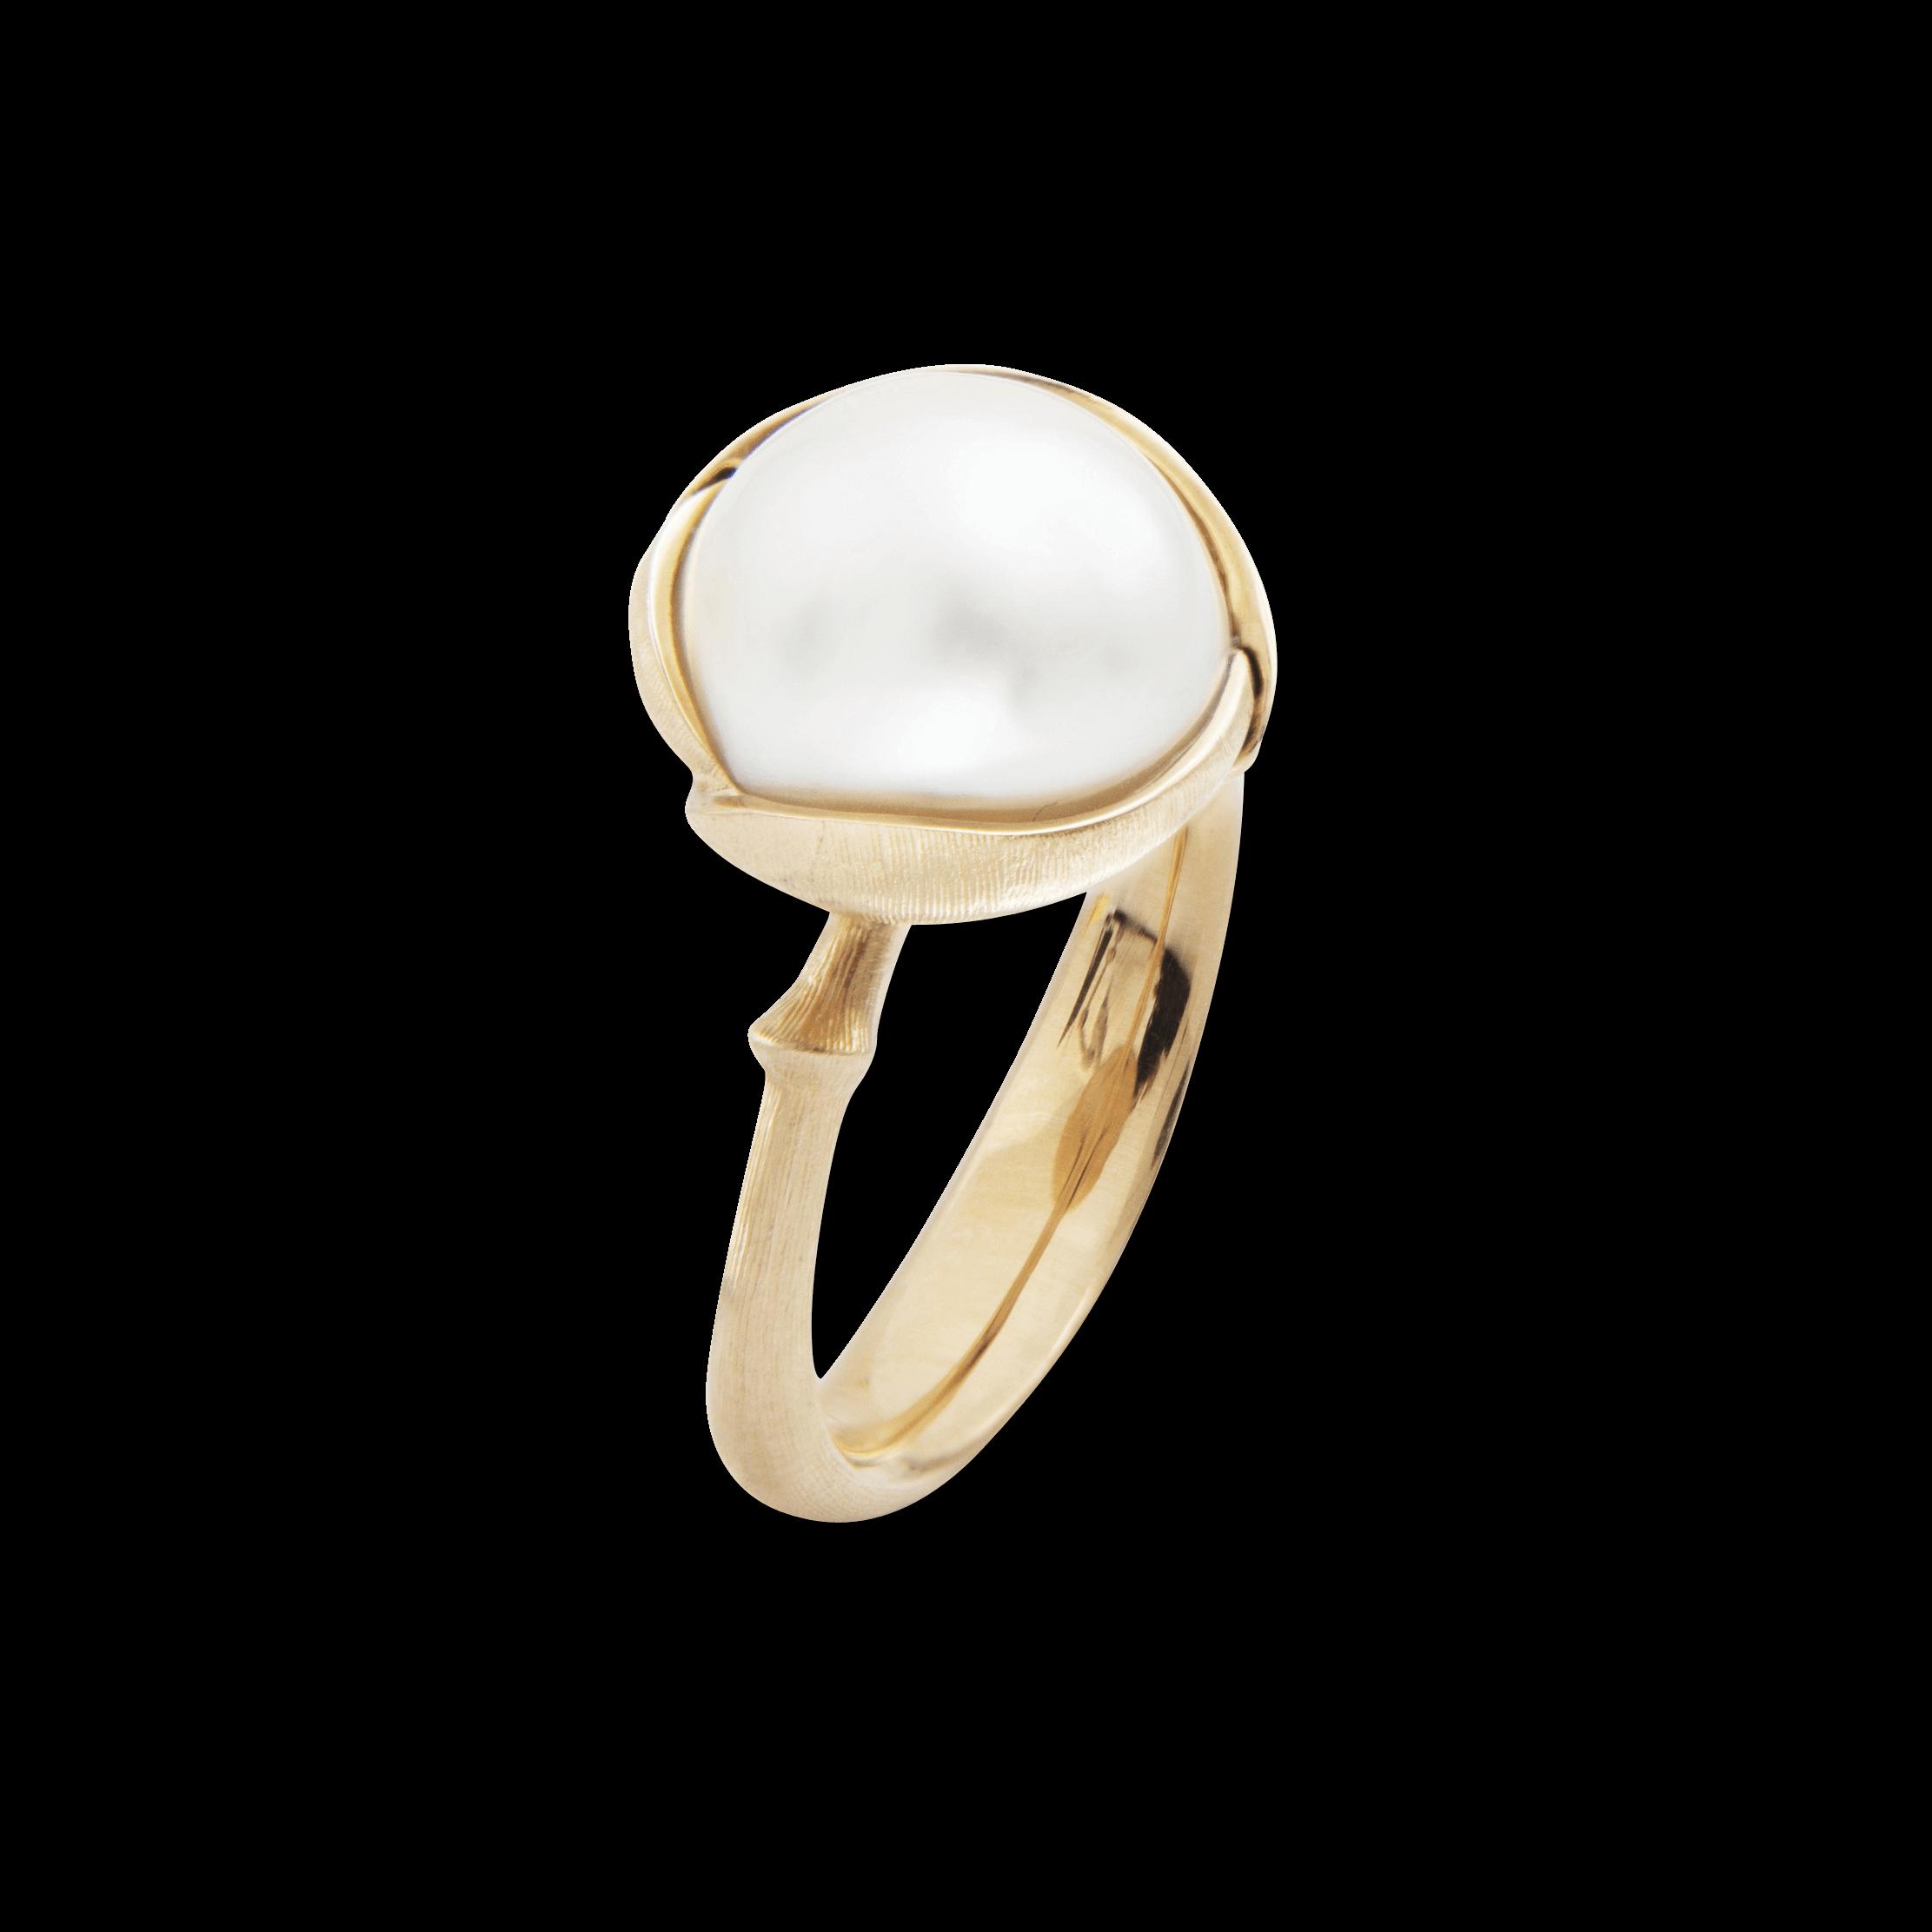 Ole Lynggaard Lotus Ring kaufen - OLA2754-401 | Brogle